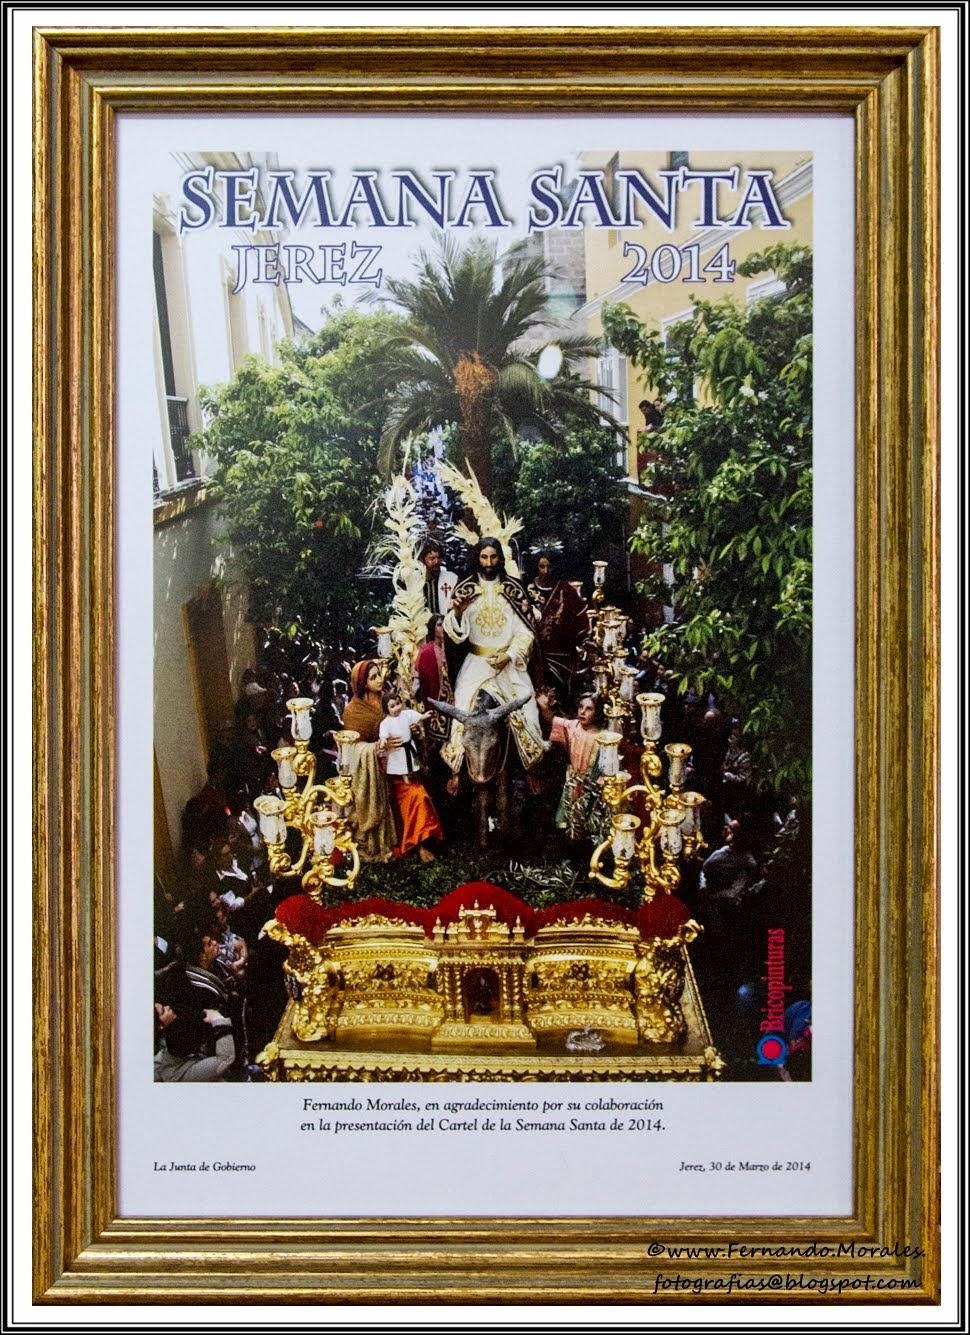 Cartel Semana Santa Jerez 2014 - Triunfal Entrada Jerusalén